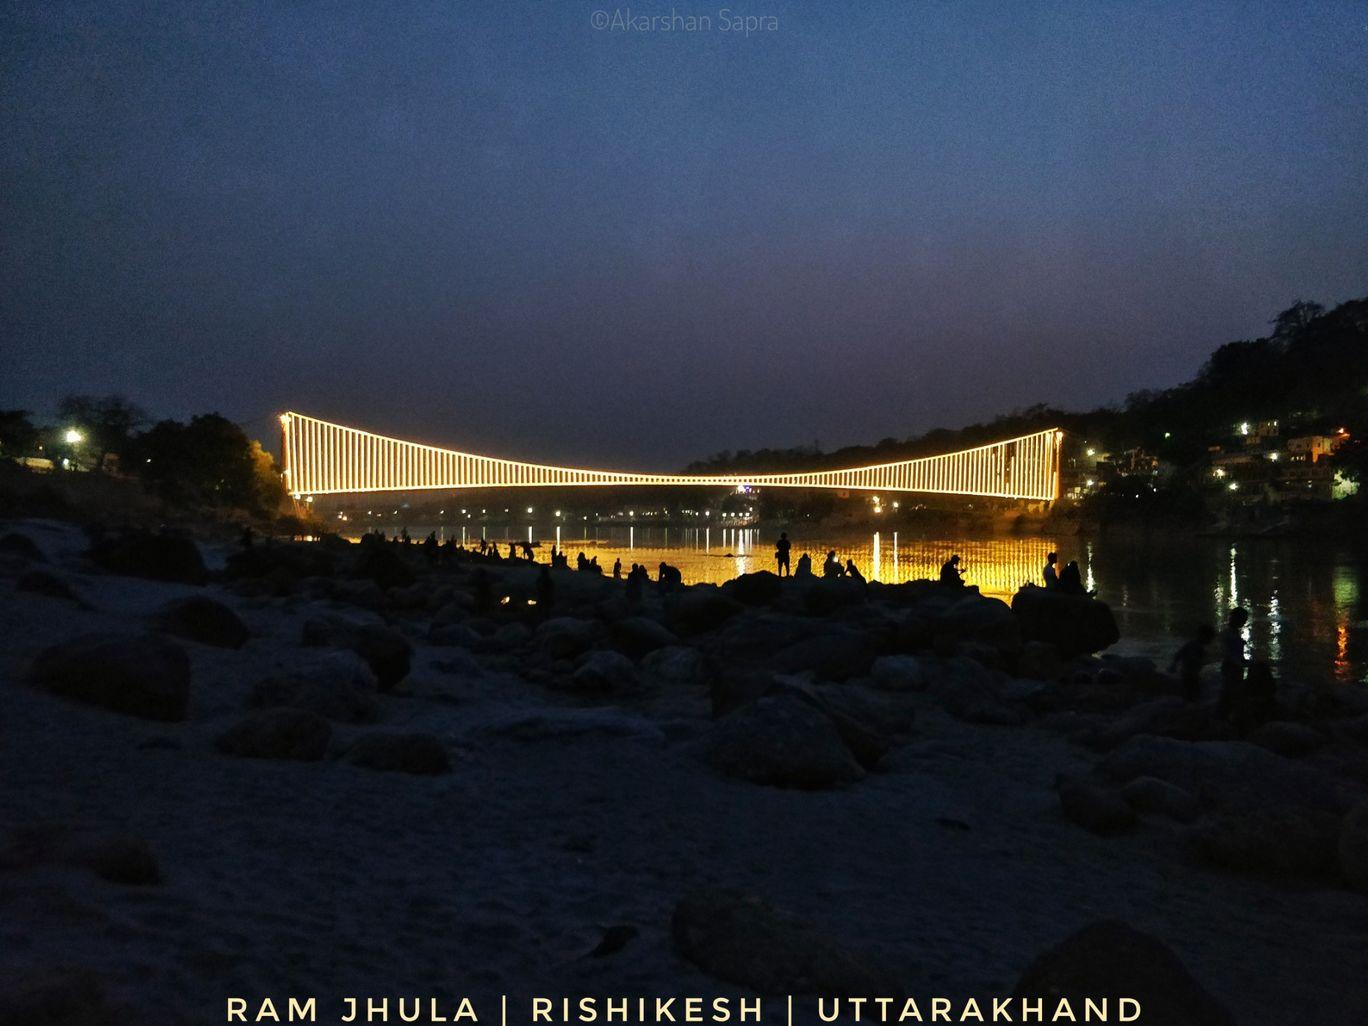 Photo of Ram Jhula By Akarshan Sapra